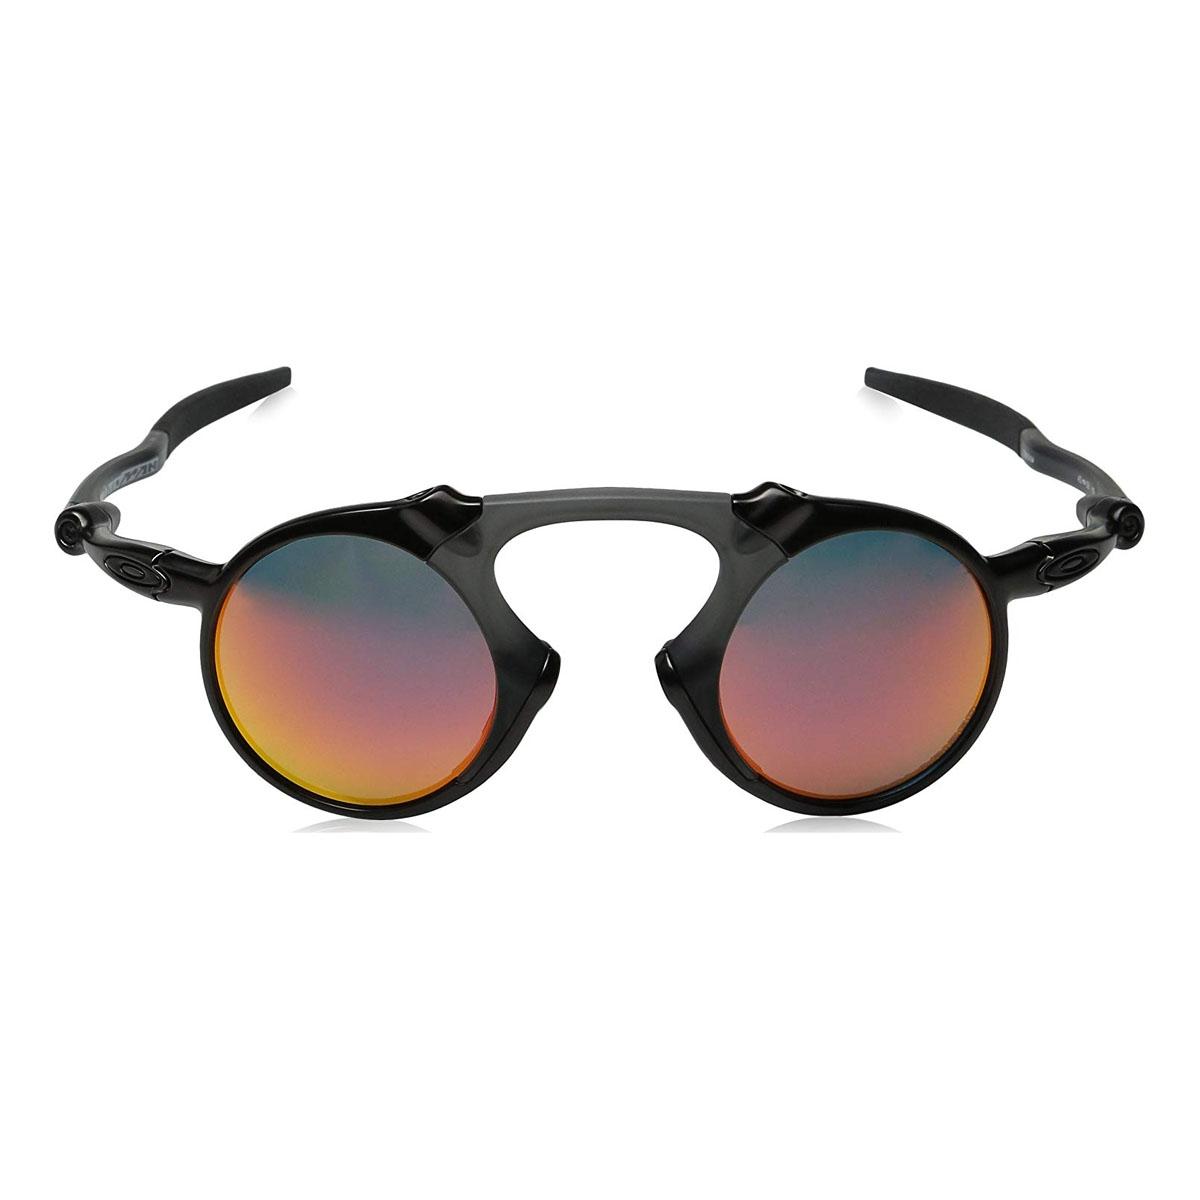 8823f8f60a1 ... spain image of oakley madman polarized sunglasses dark carbon frame  ruby iridium polarized lens. c84fe